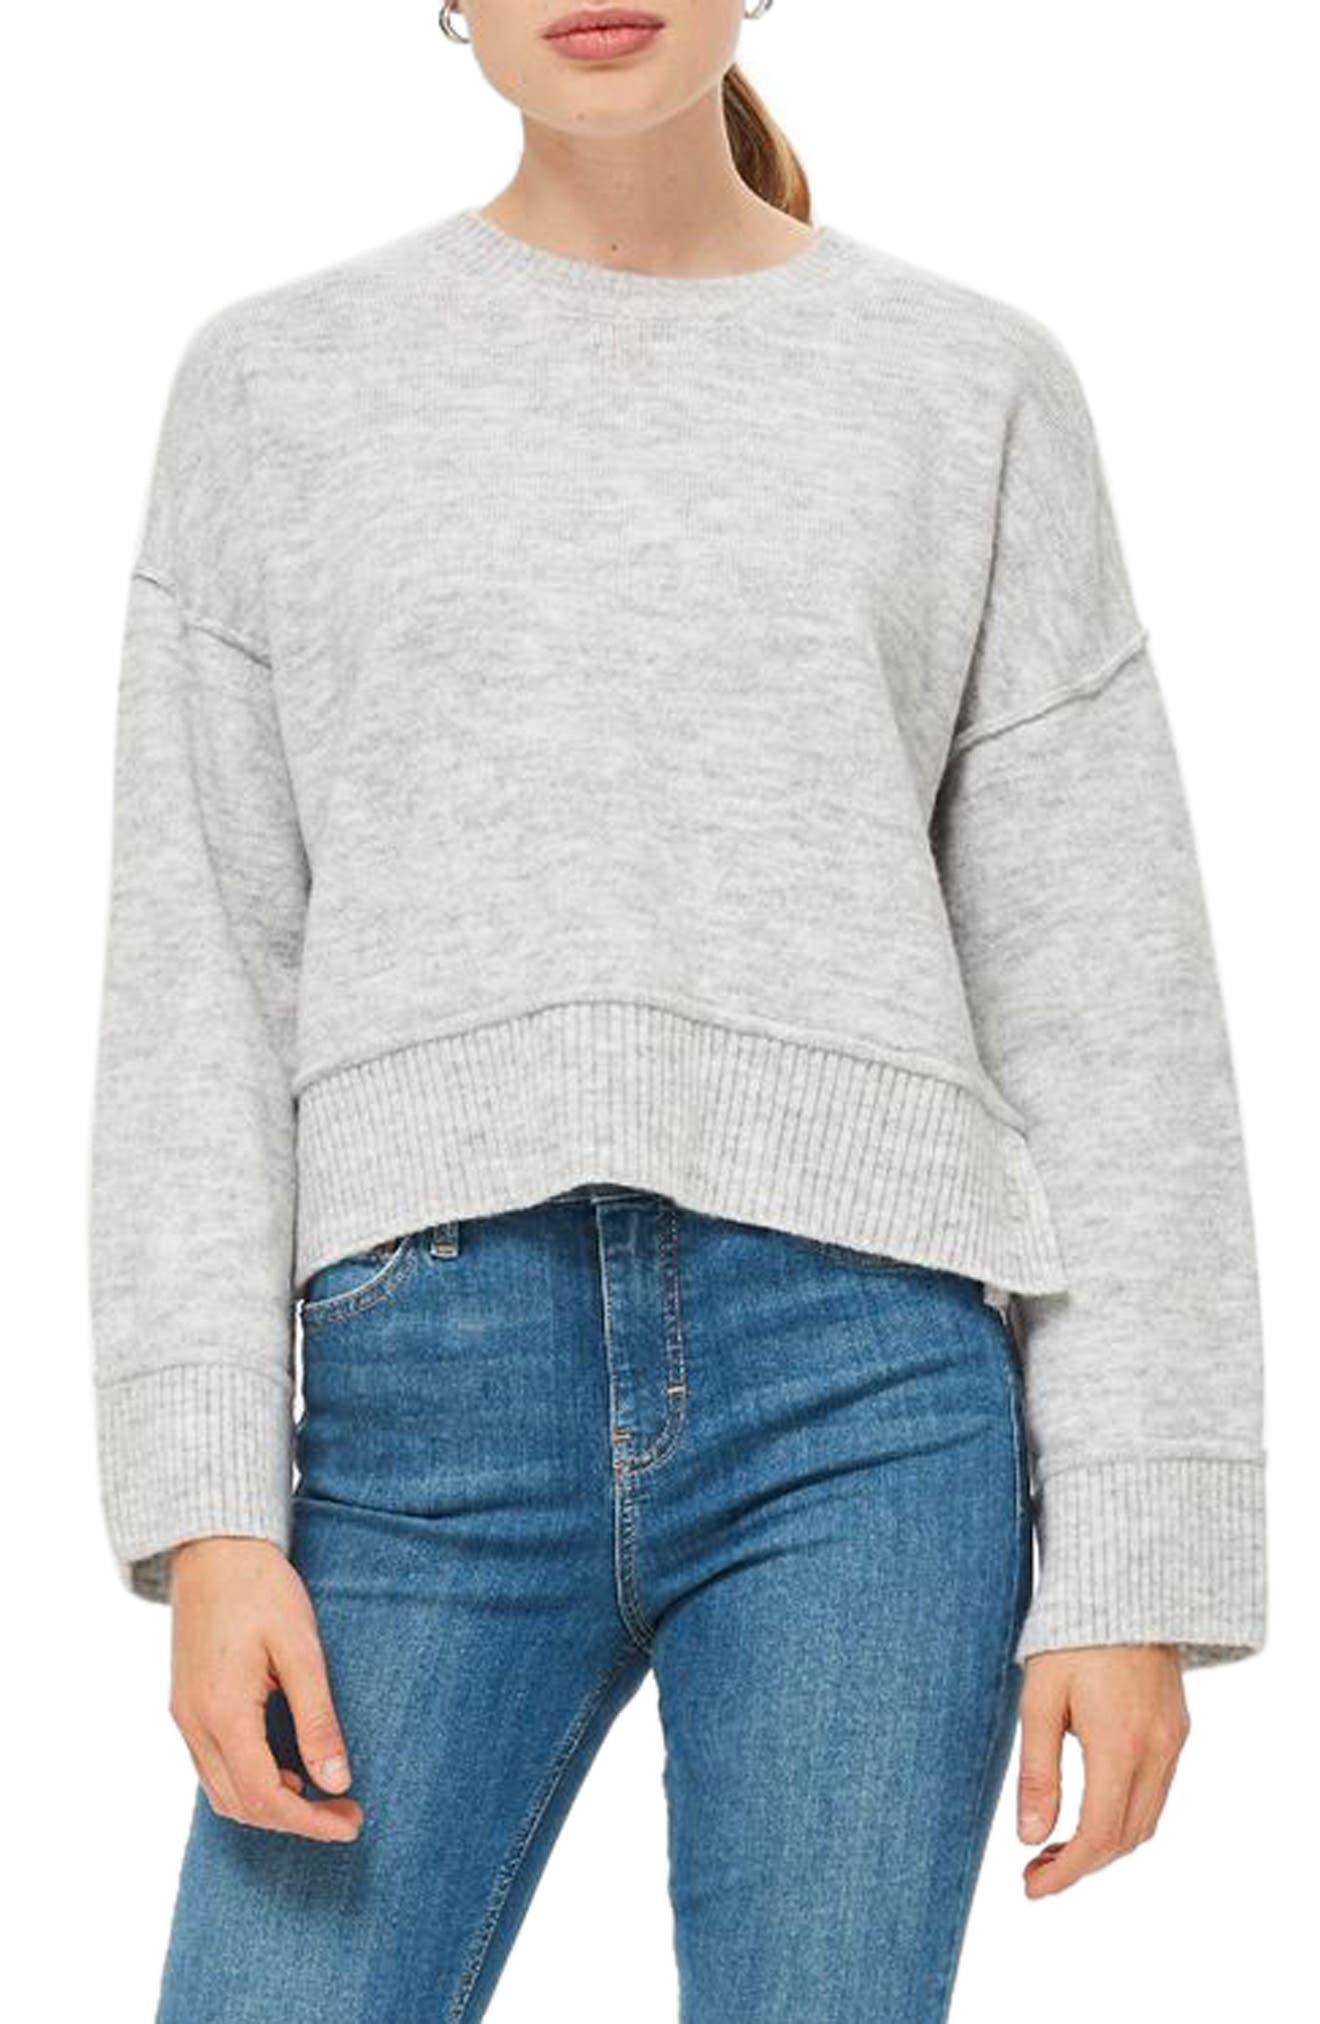 Mo Seam Detail Popper Sweater,                             Main thumbnail 1, color,                             GREY MARL